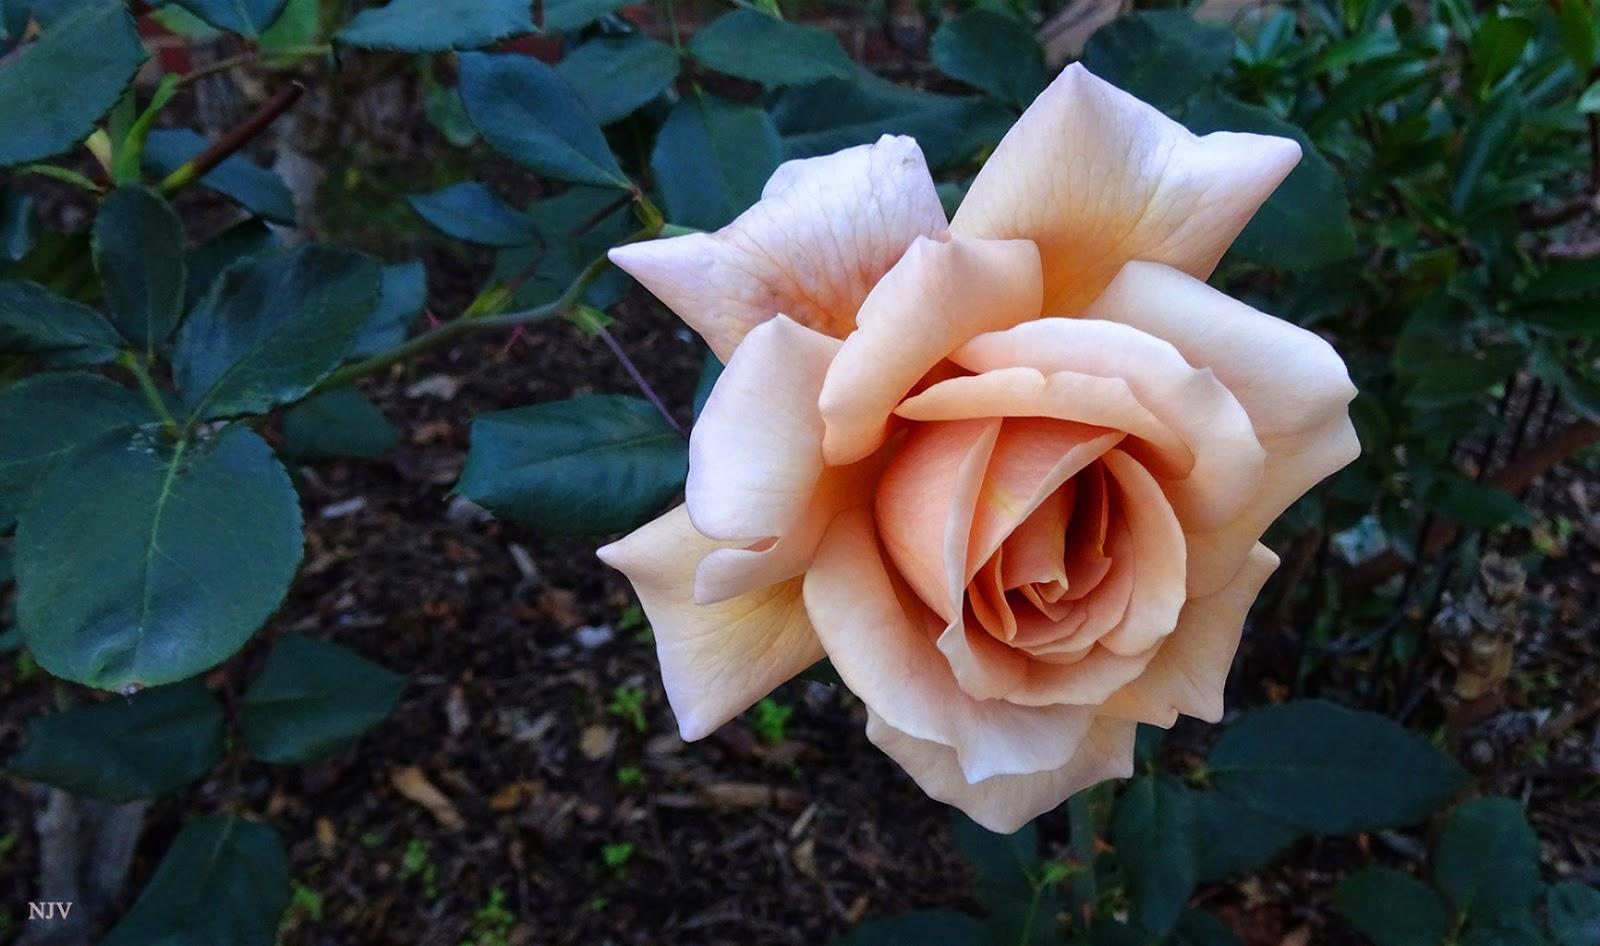 Floral Friday Fotos November 2019